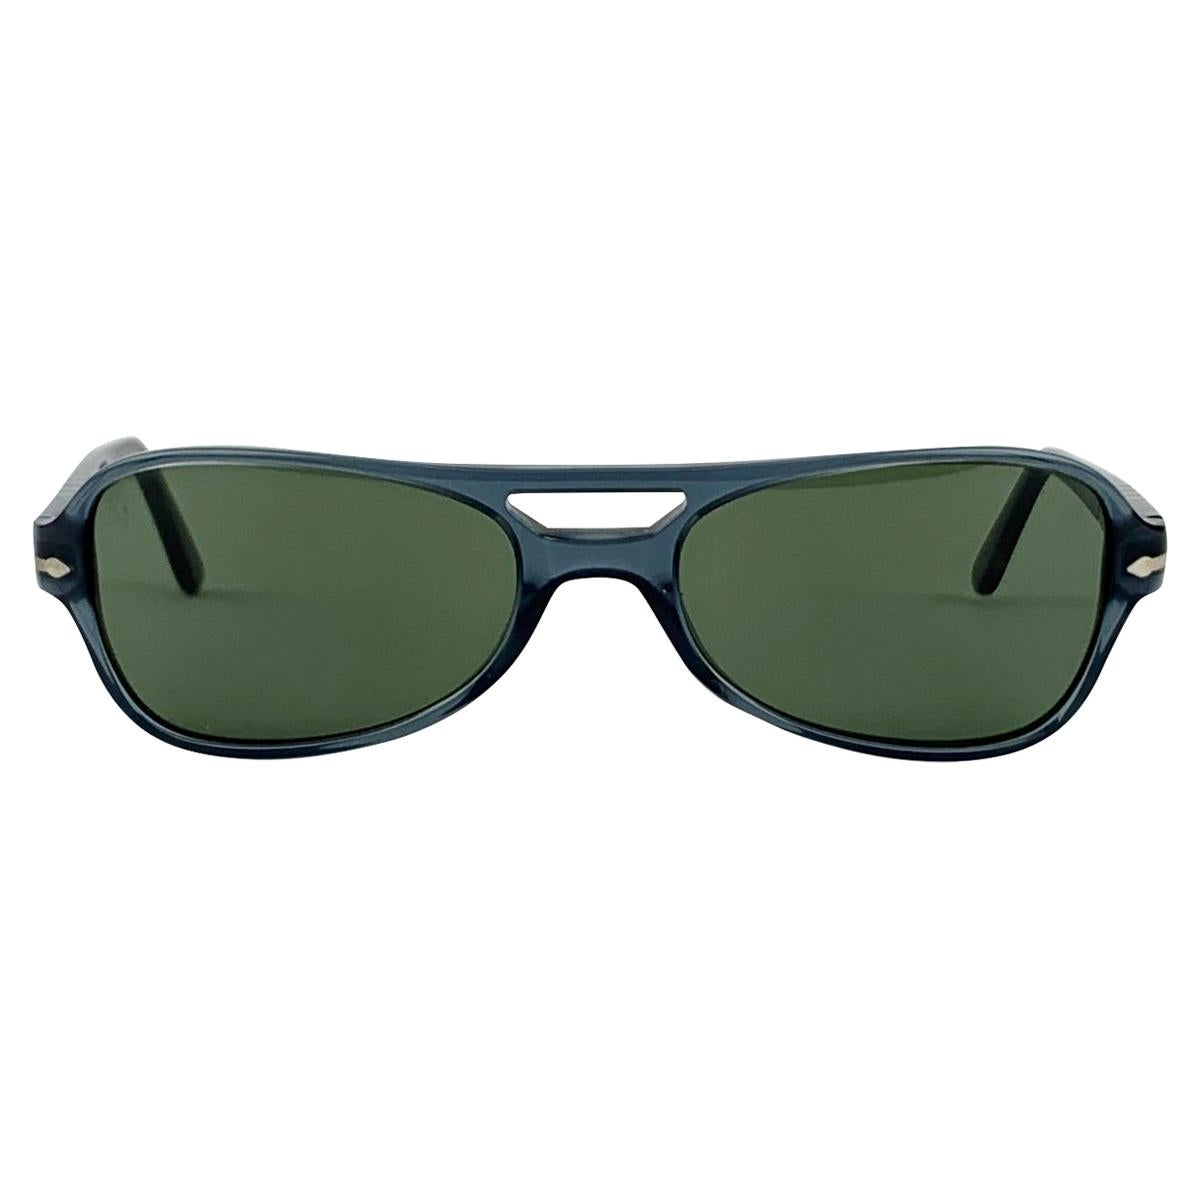 Persol Vintage Mint Grey Aviator Sunglasses 2628-S 55/18 135 mm